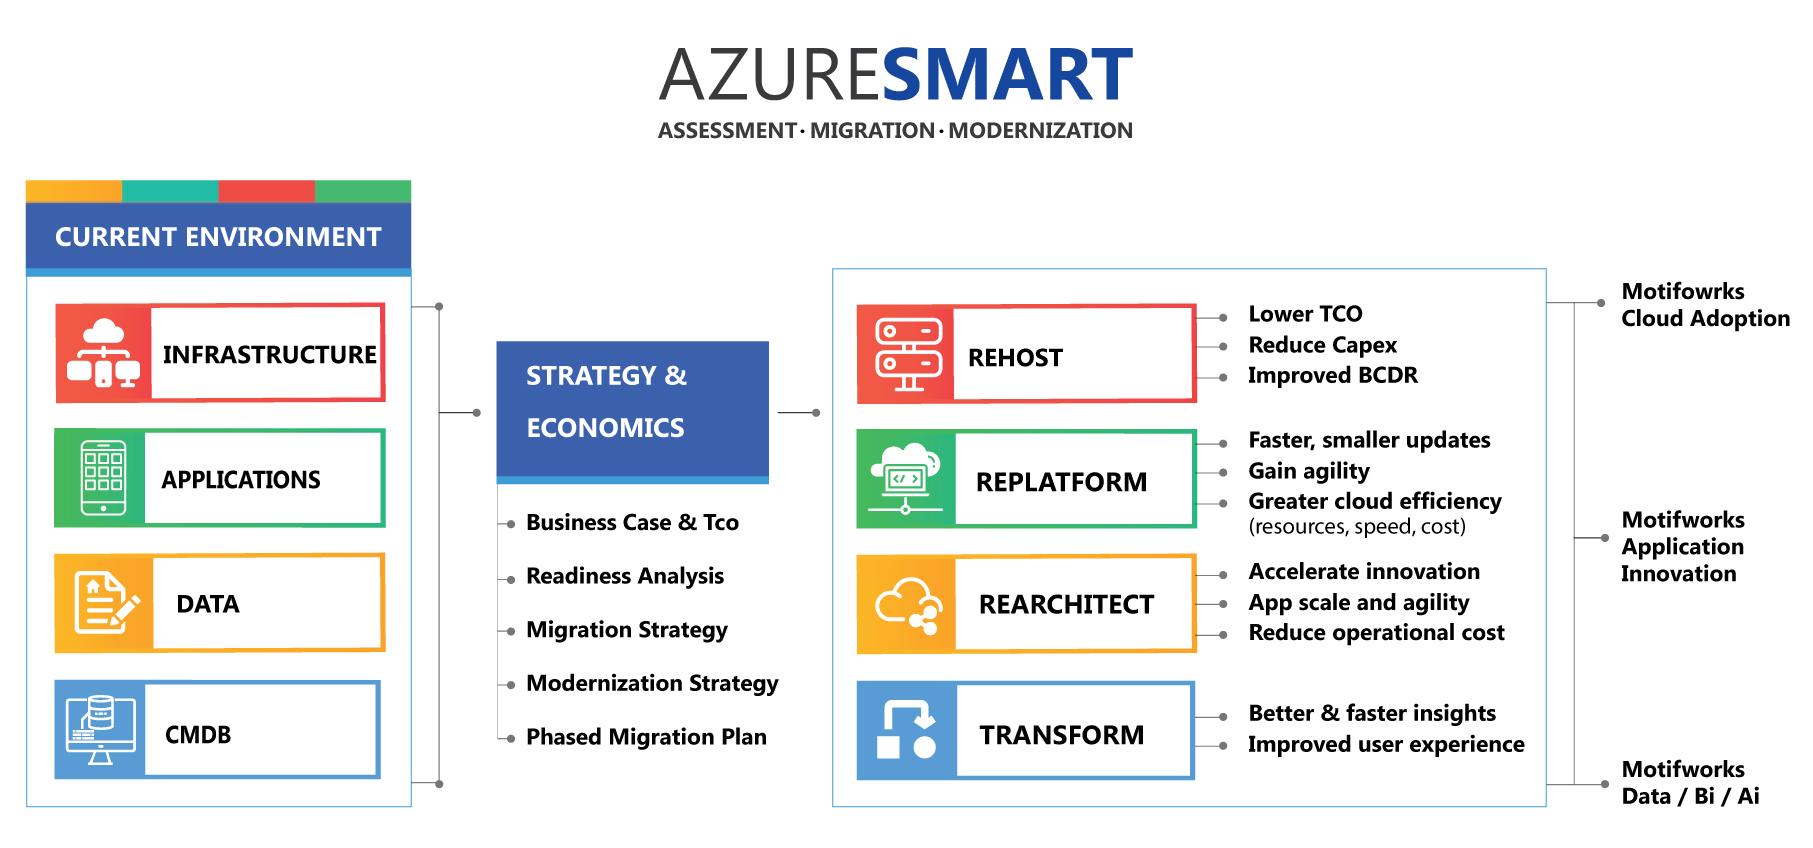 Motifworks AzureSmart Architecture